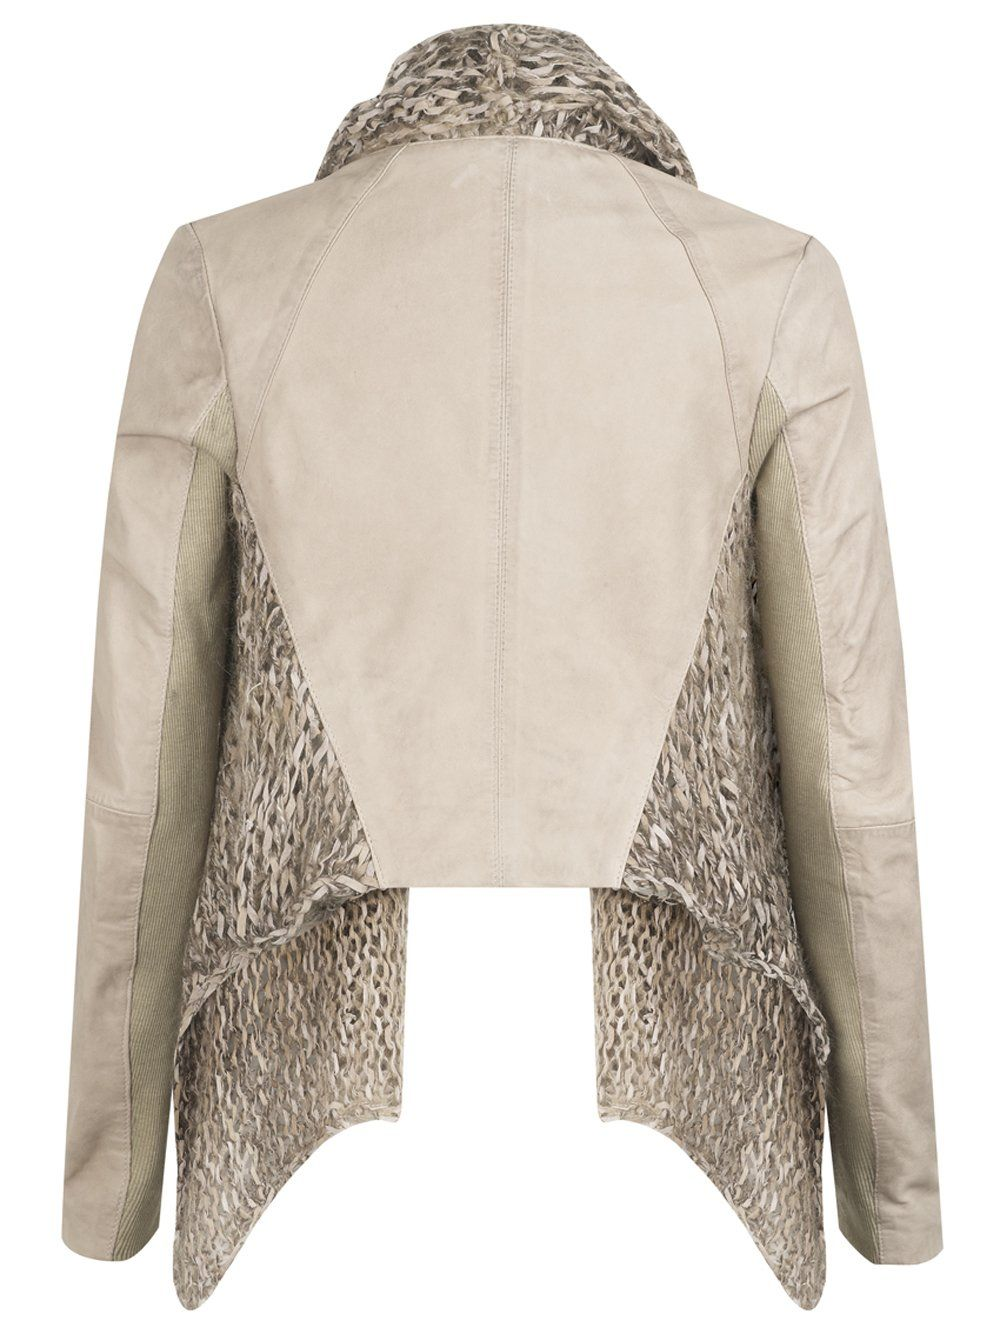 Muubaa Galatti Knitted Leather Waterfall Jacket in Beige Stone